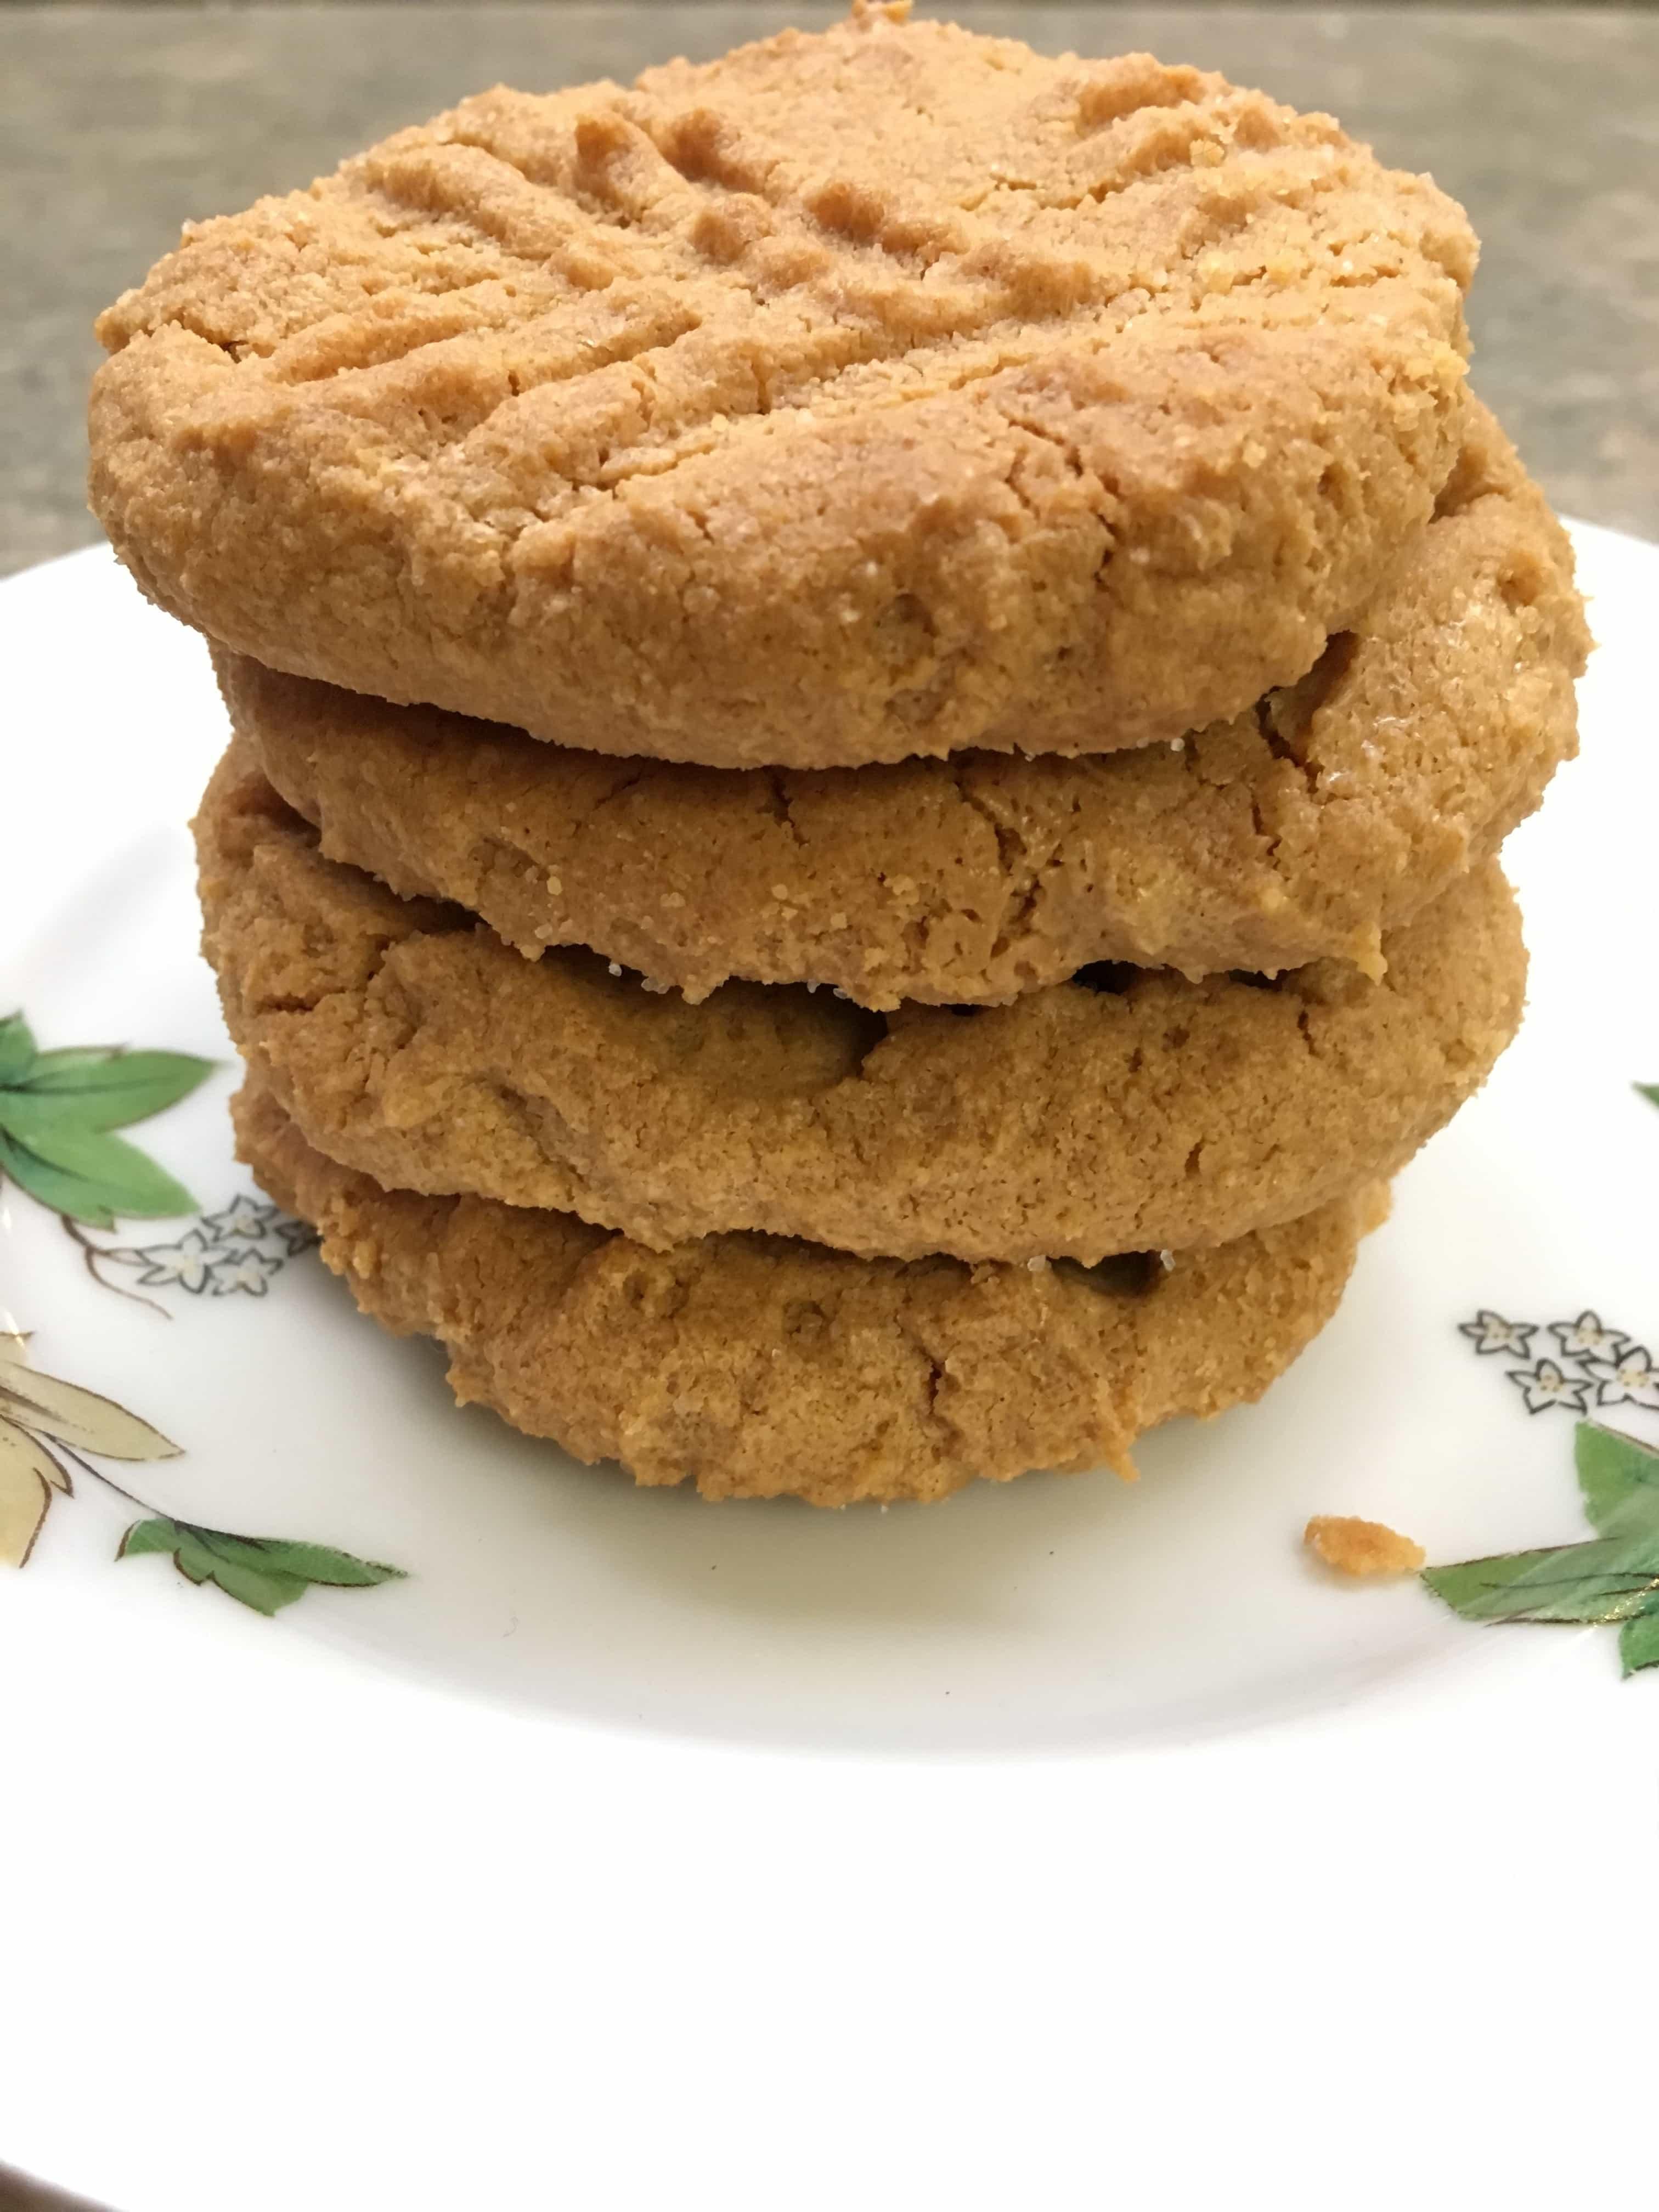 The Easiest Gluten-Free Peanut Butter Cookies Around